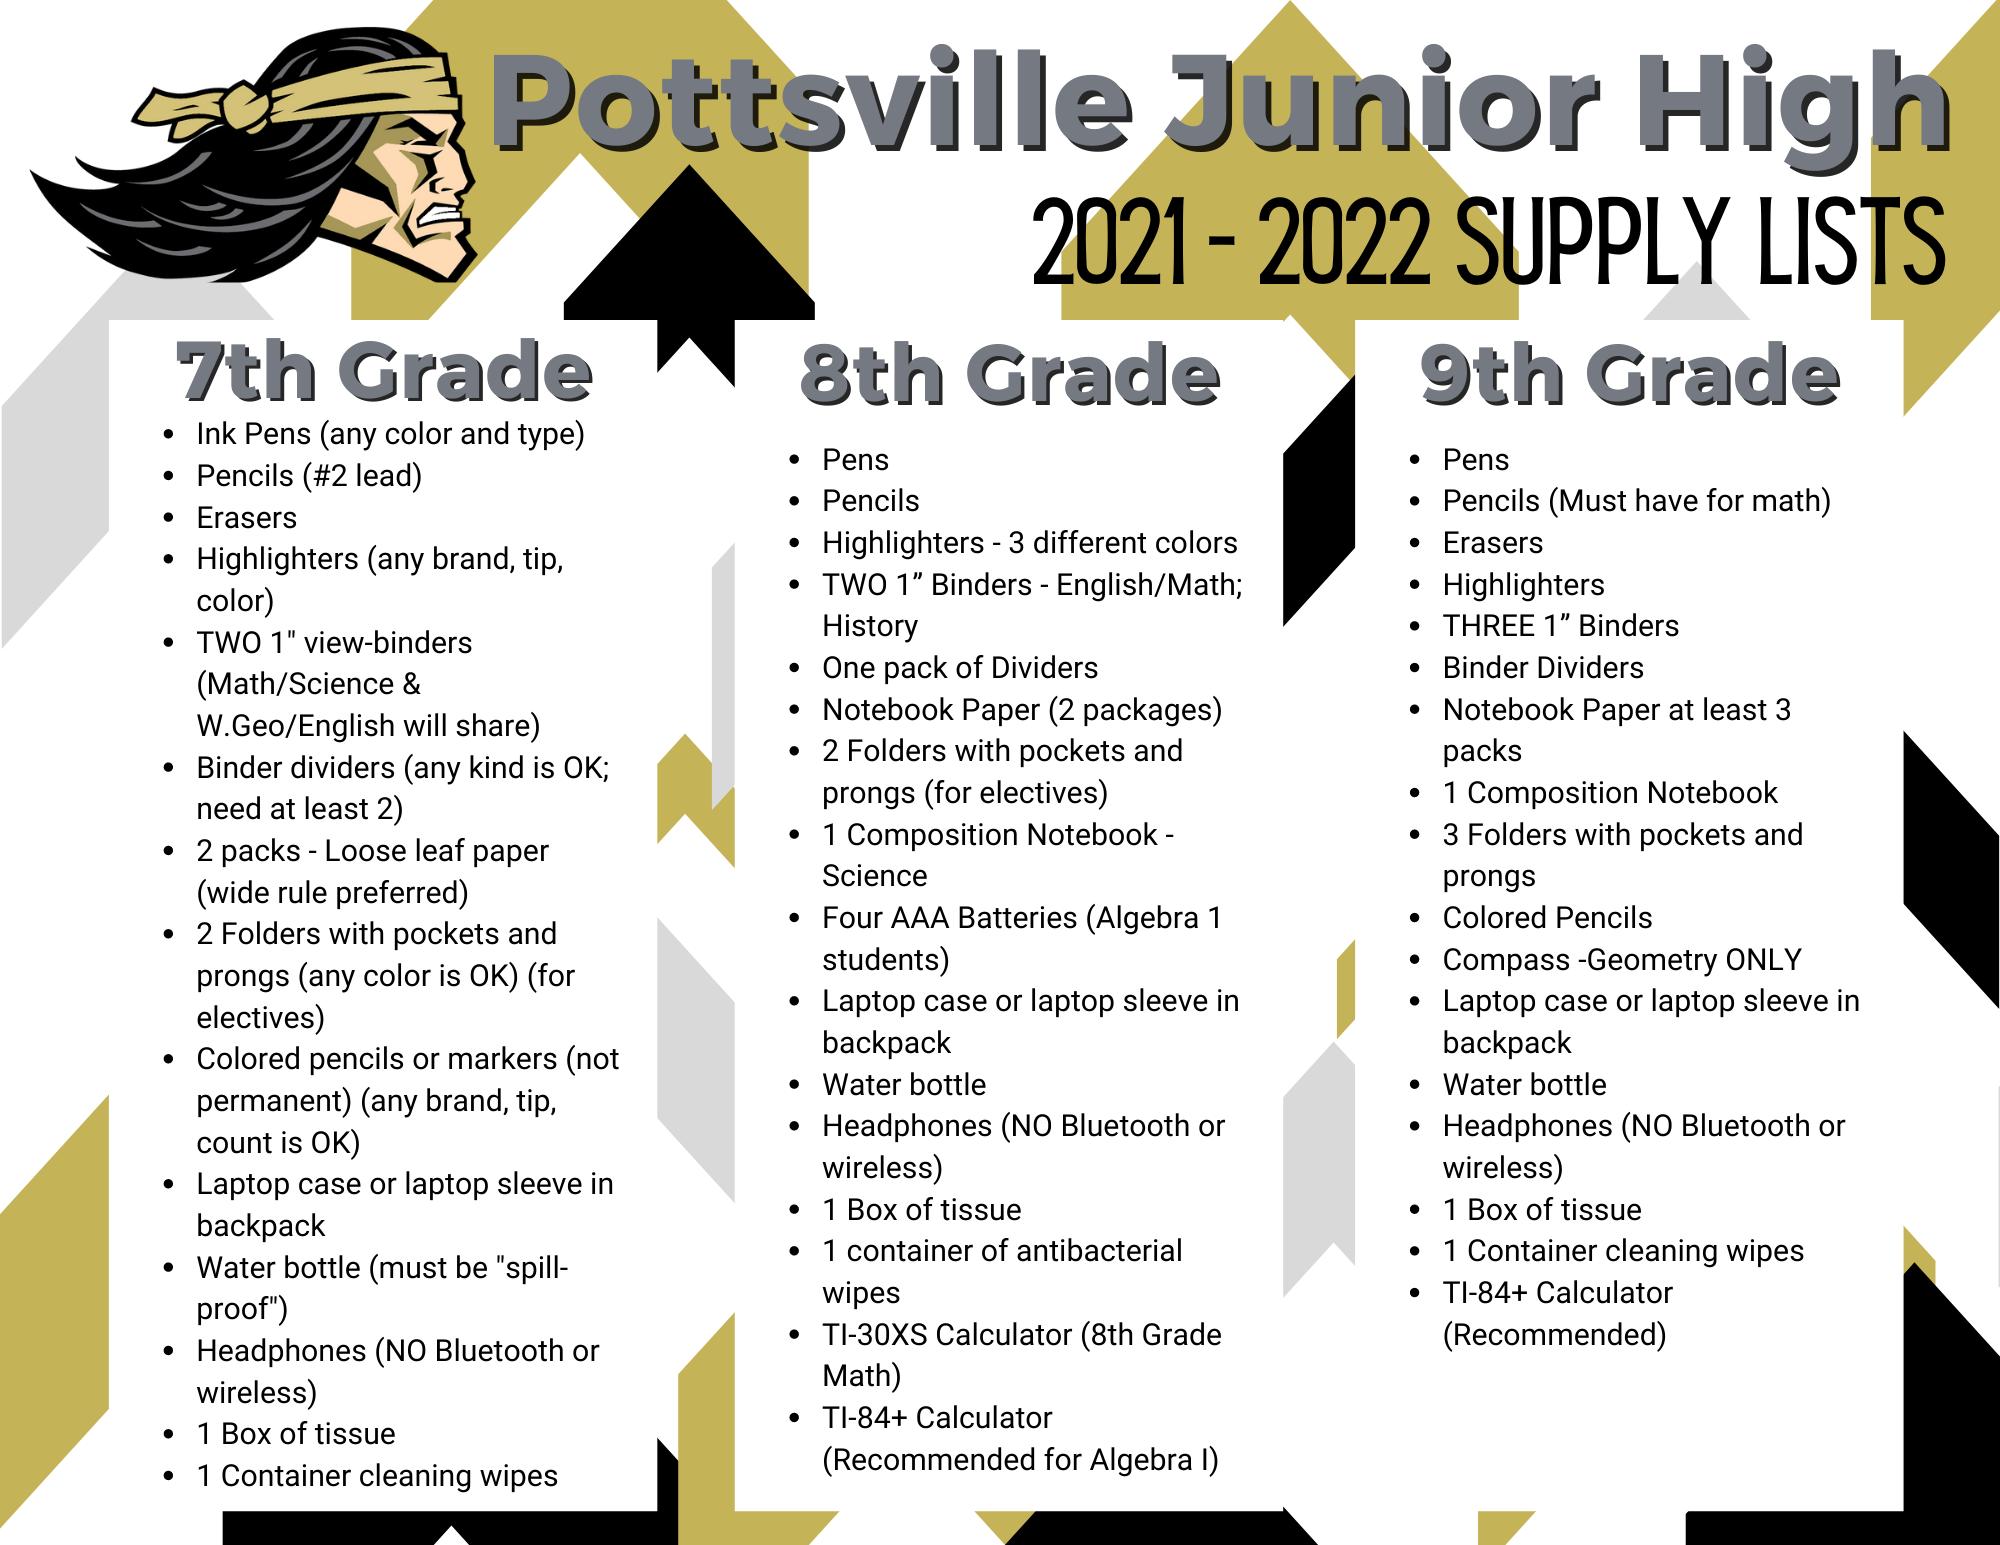 Junior High School Supply Lists